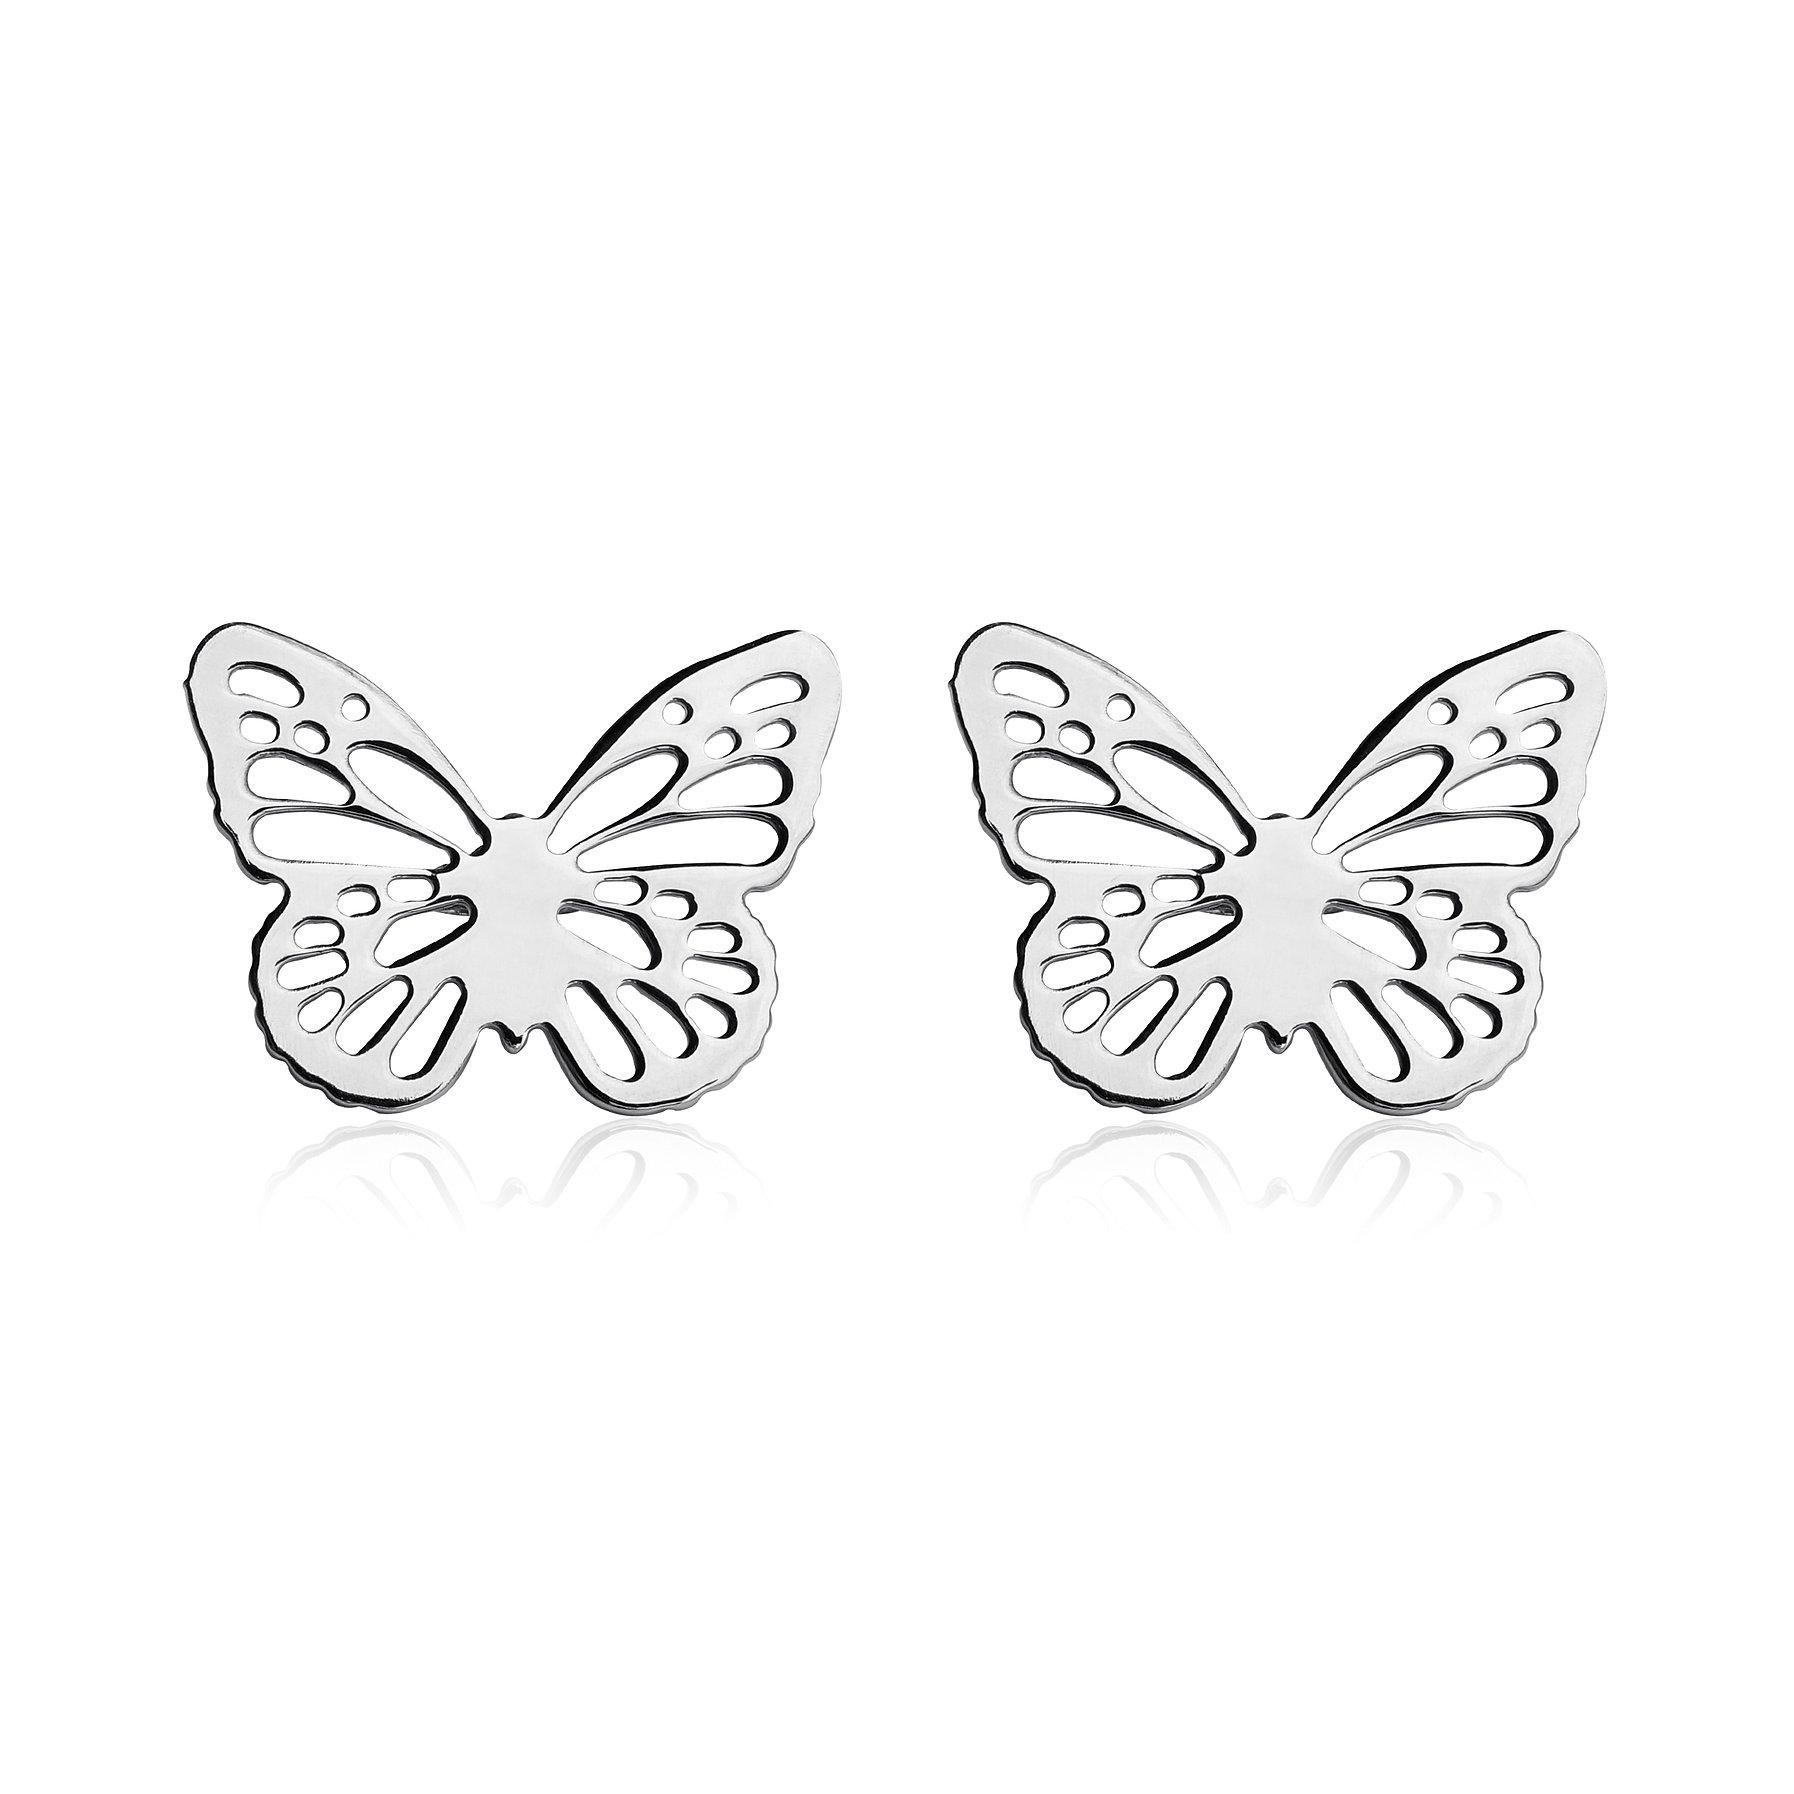 Wings Of Change nausnice 4